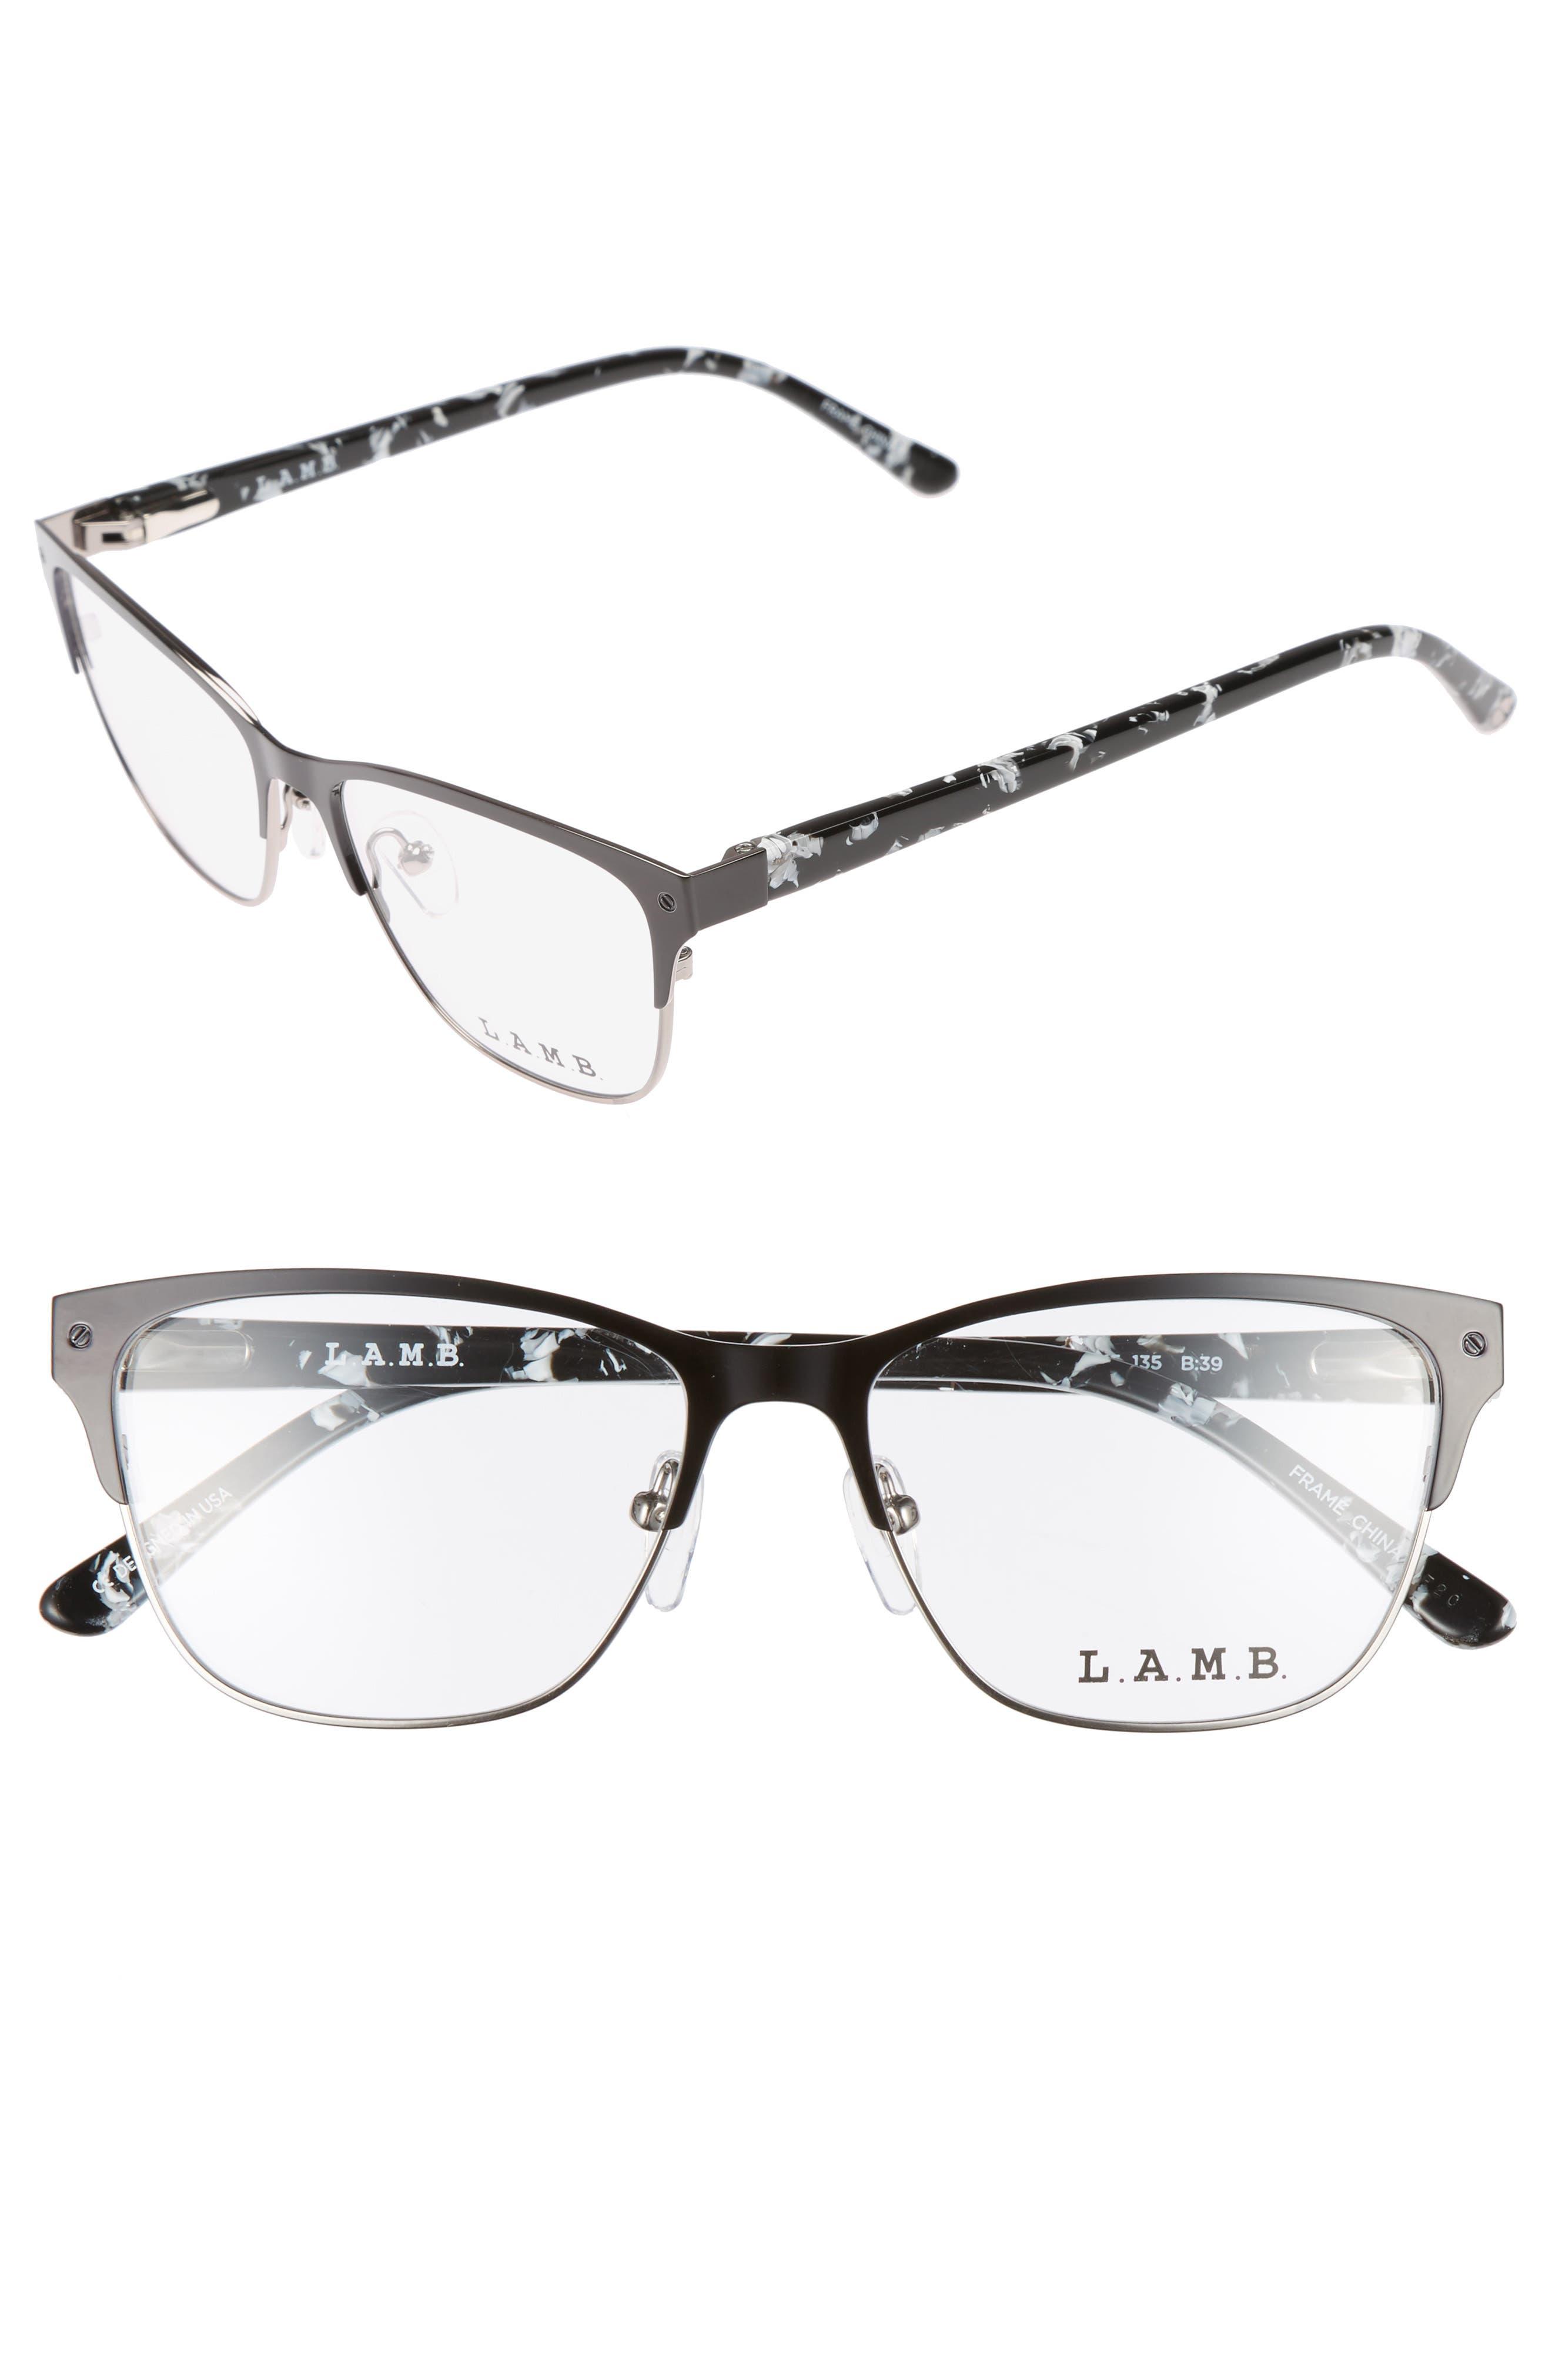 52mm Cat Eye Optical Glasses,                             Main thumbnail 1, color,